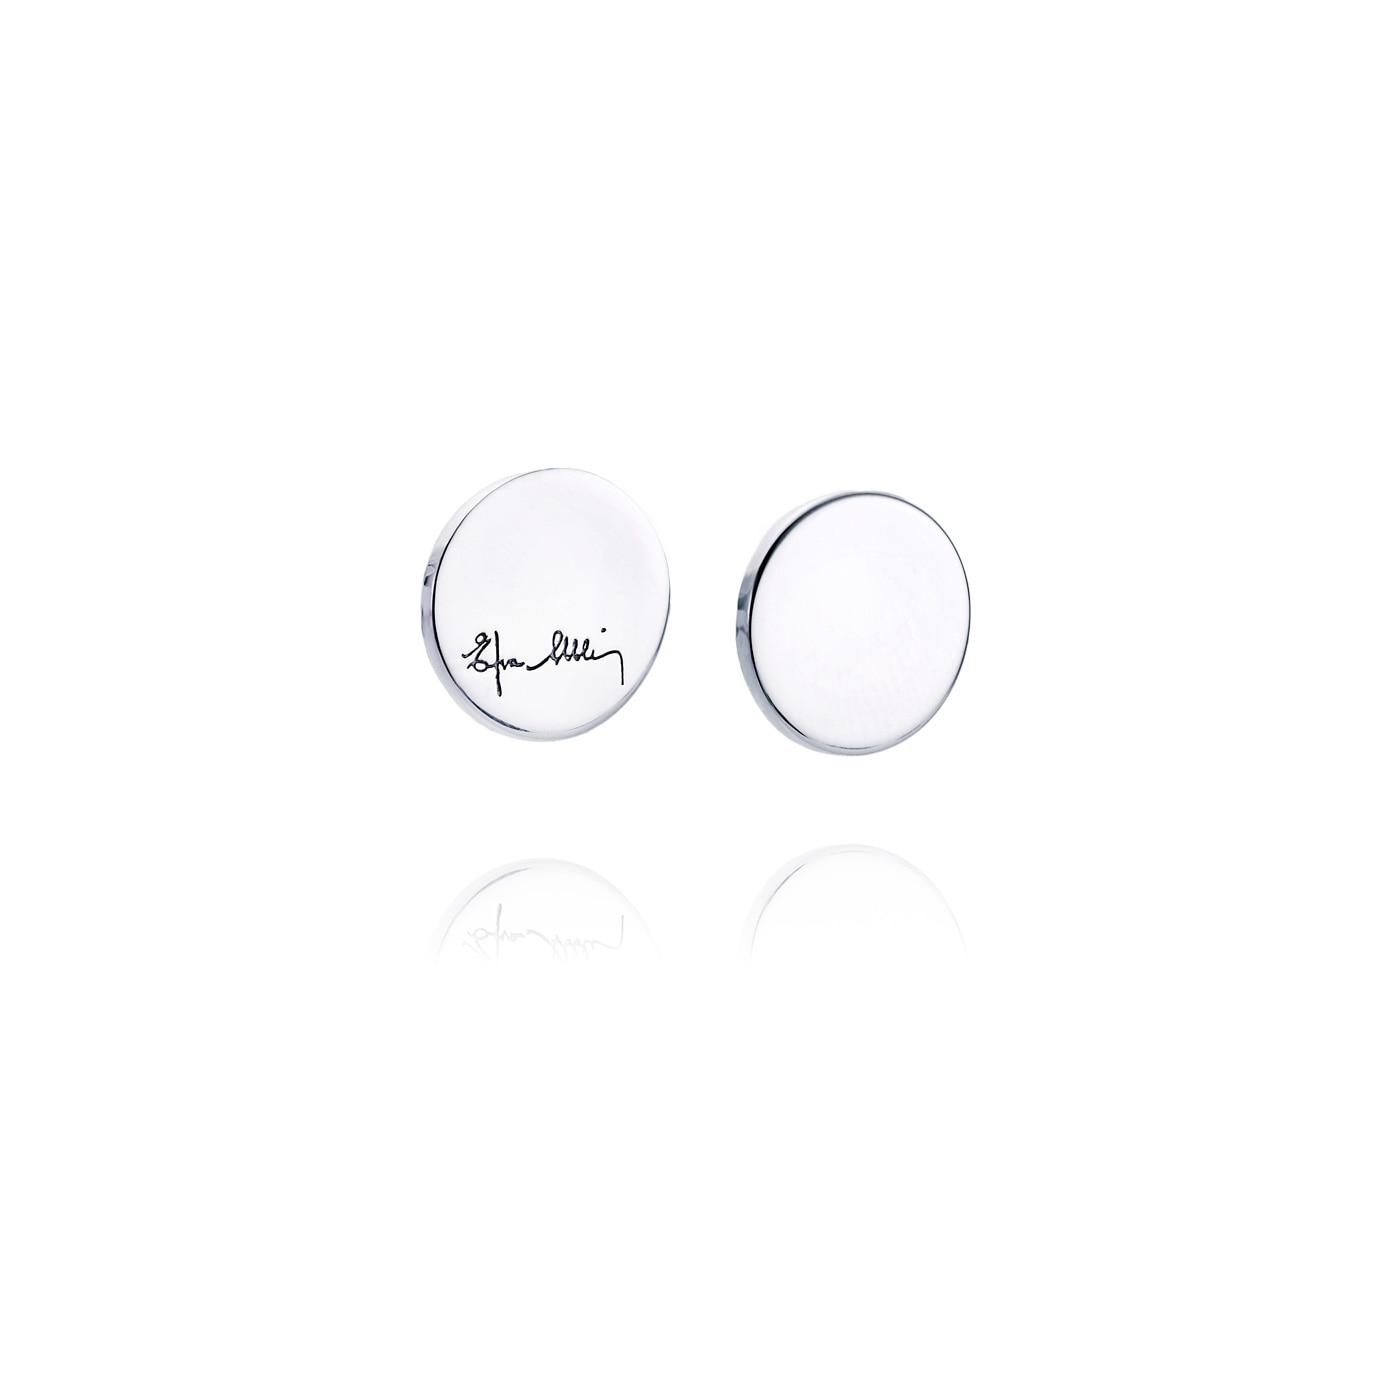 Dots-Ear-12-100-00481(1)